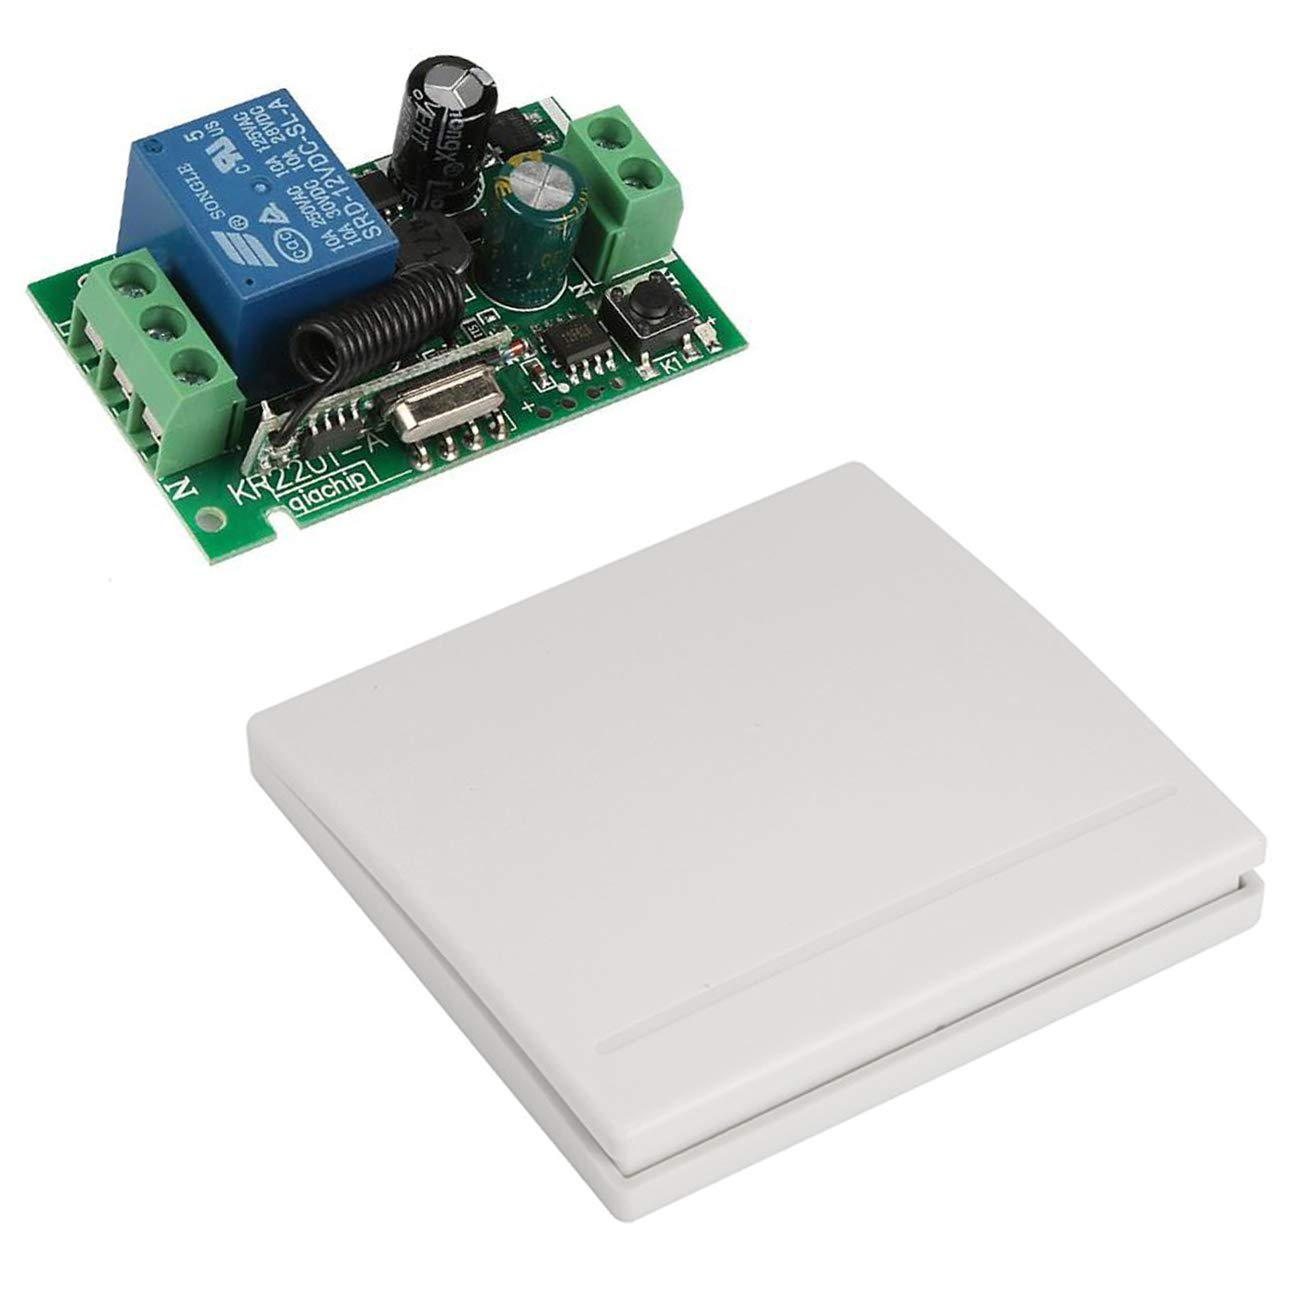 Populära YLX Universal 1CH AC 110V Channel Remote Control Switch Mini FT-05